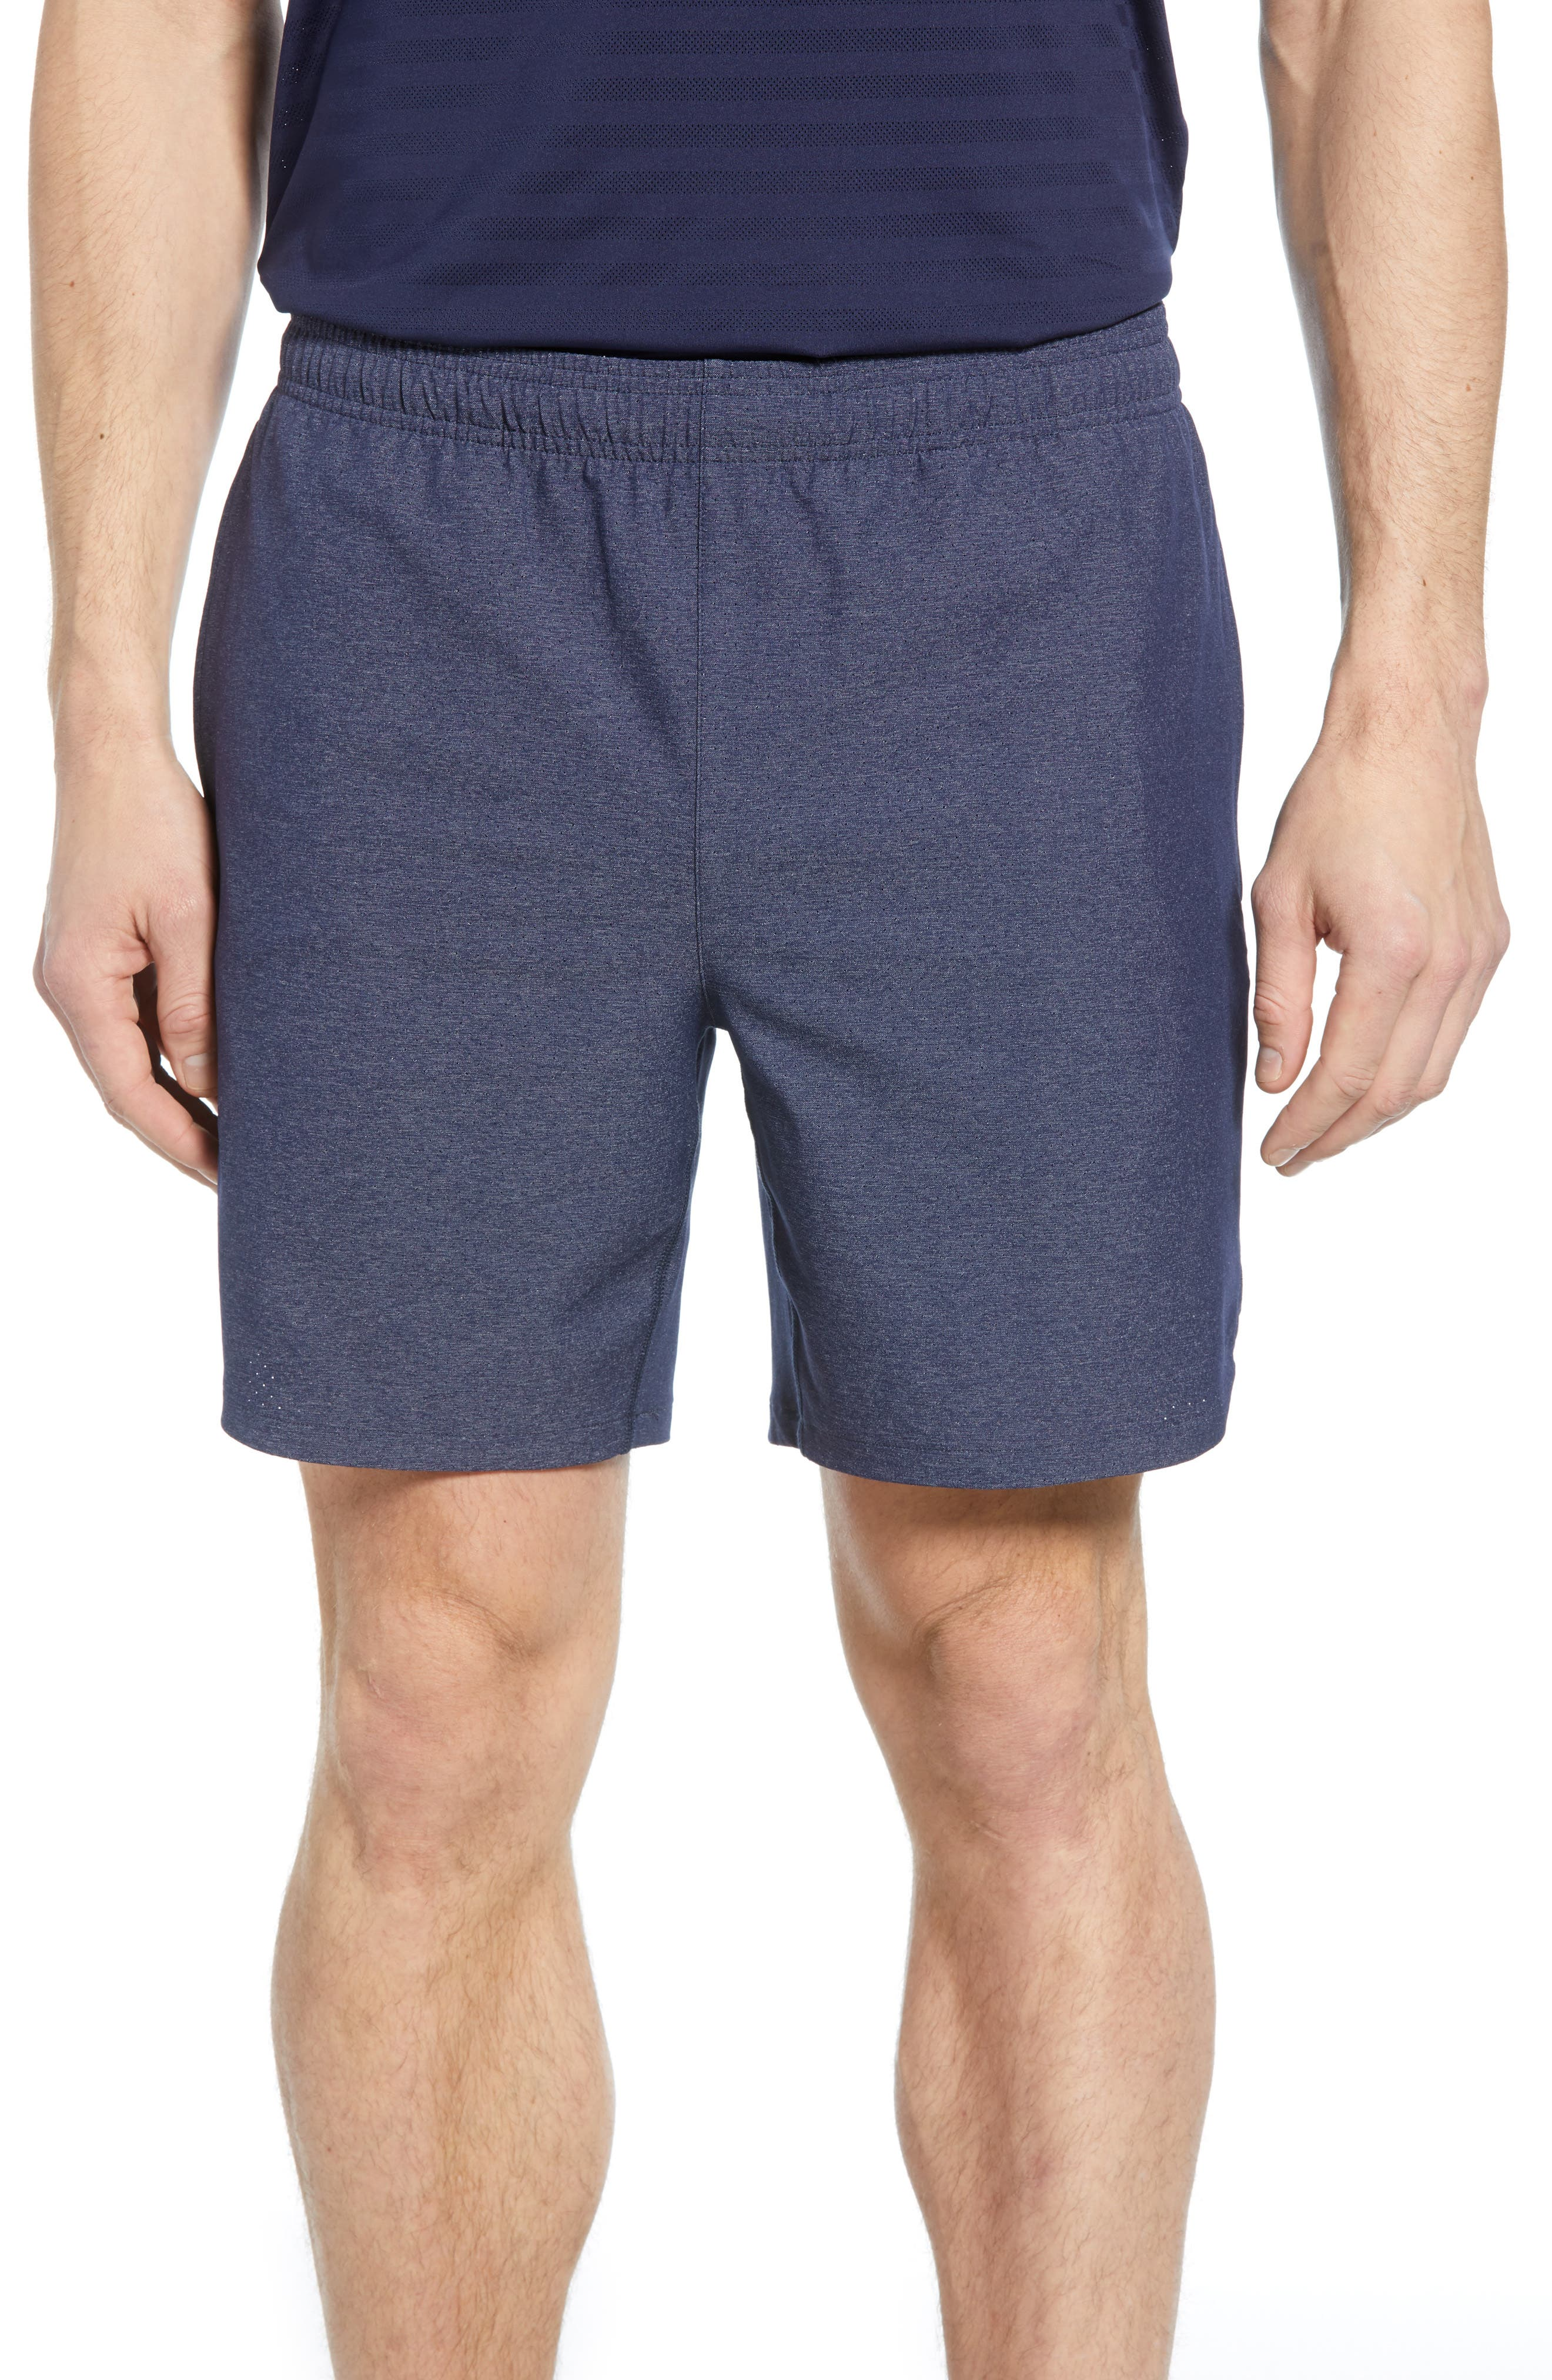 Men's Rhone Guru Athletic Shorts